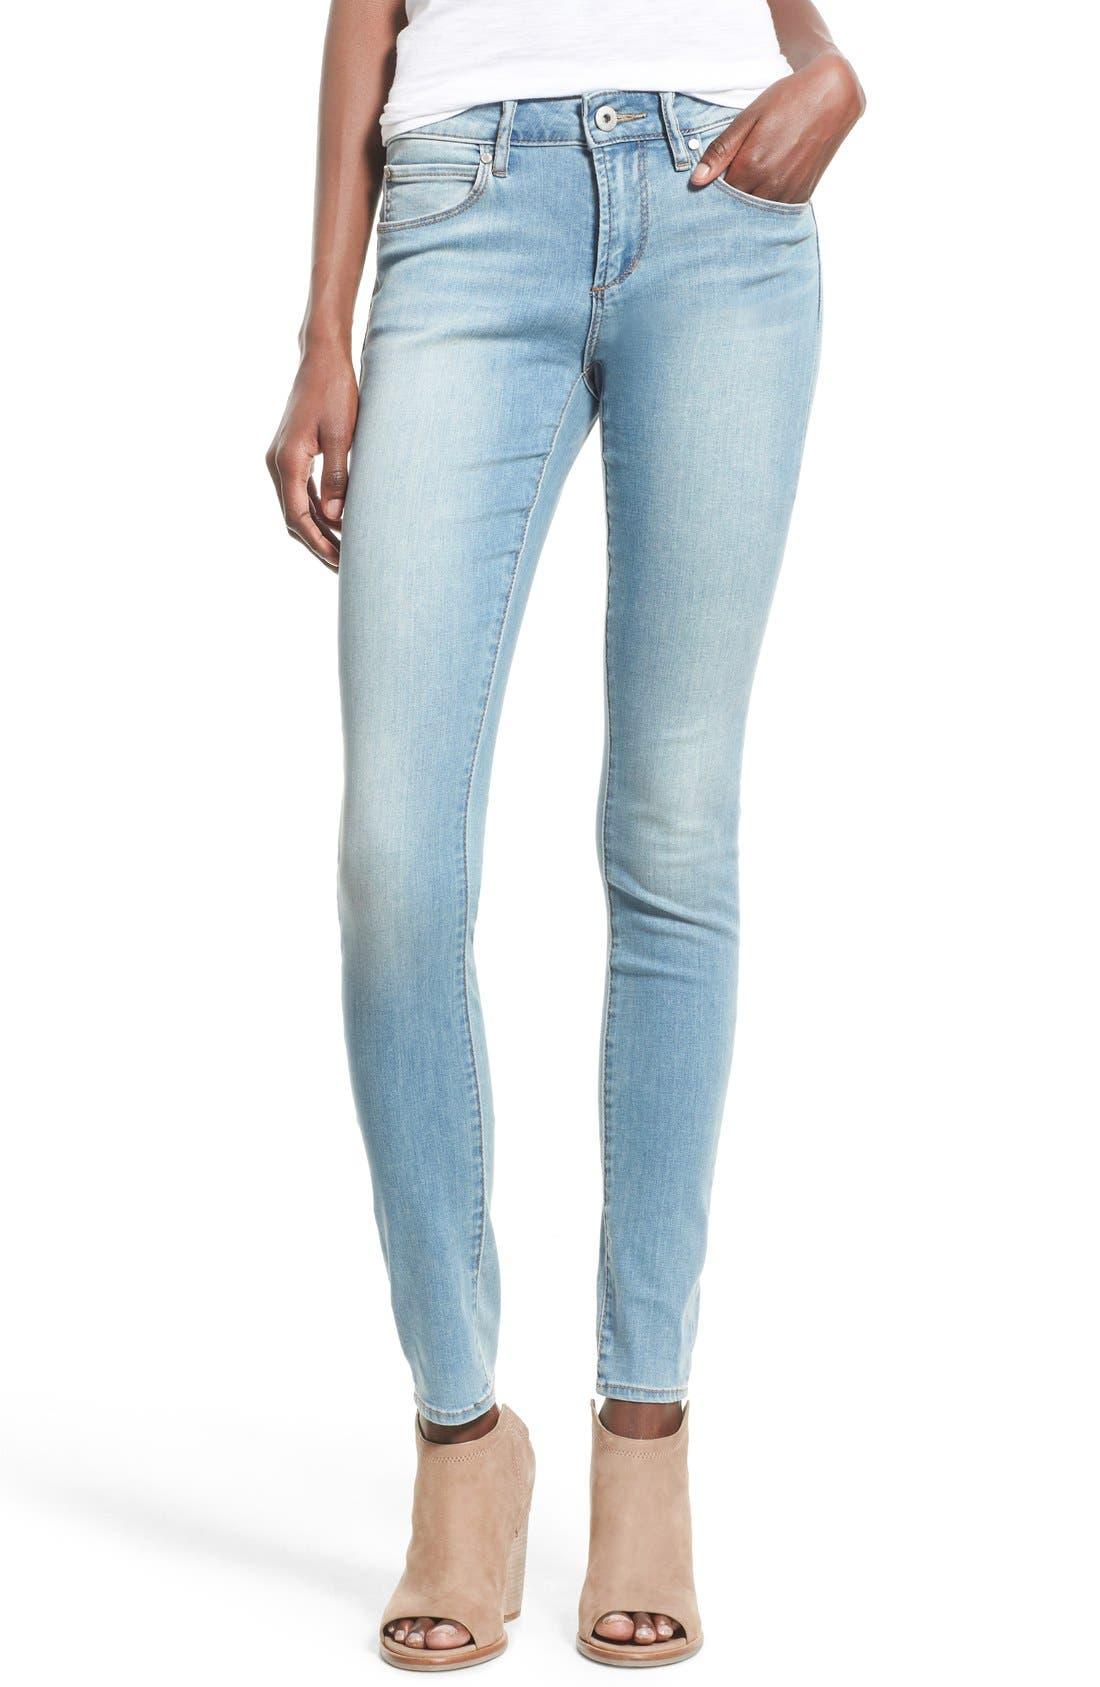 Main Image - Articles of Society 'Mya' Skinny Jeans (Indigo Wash)